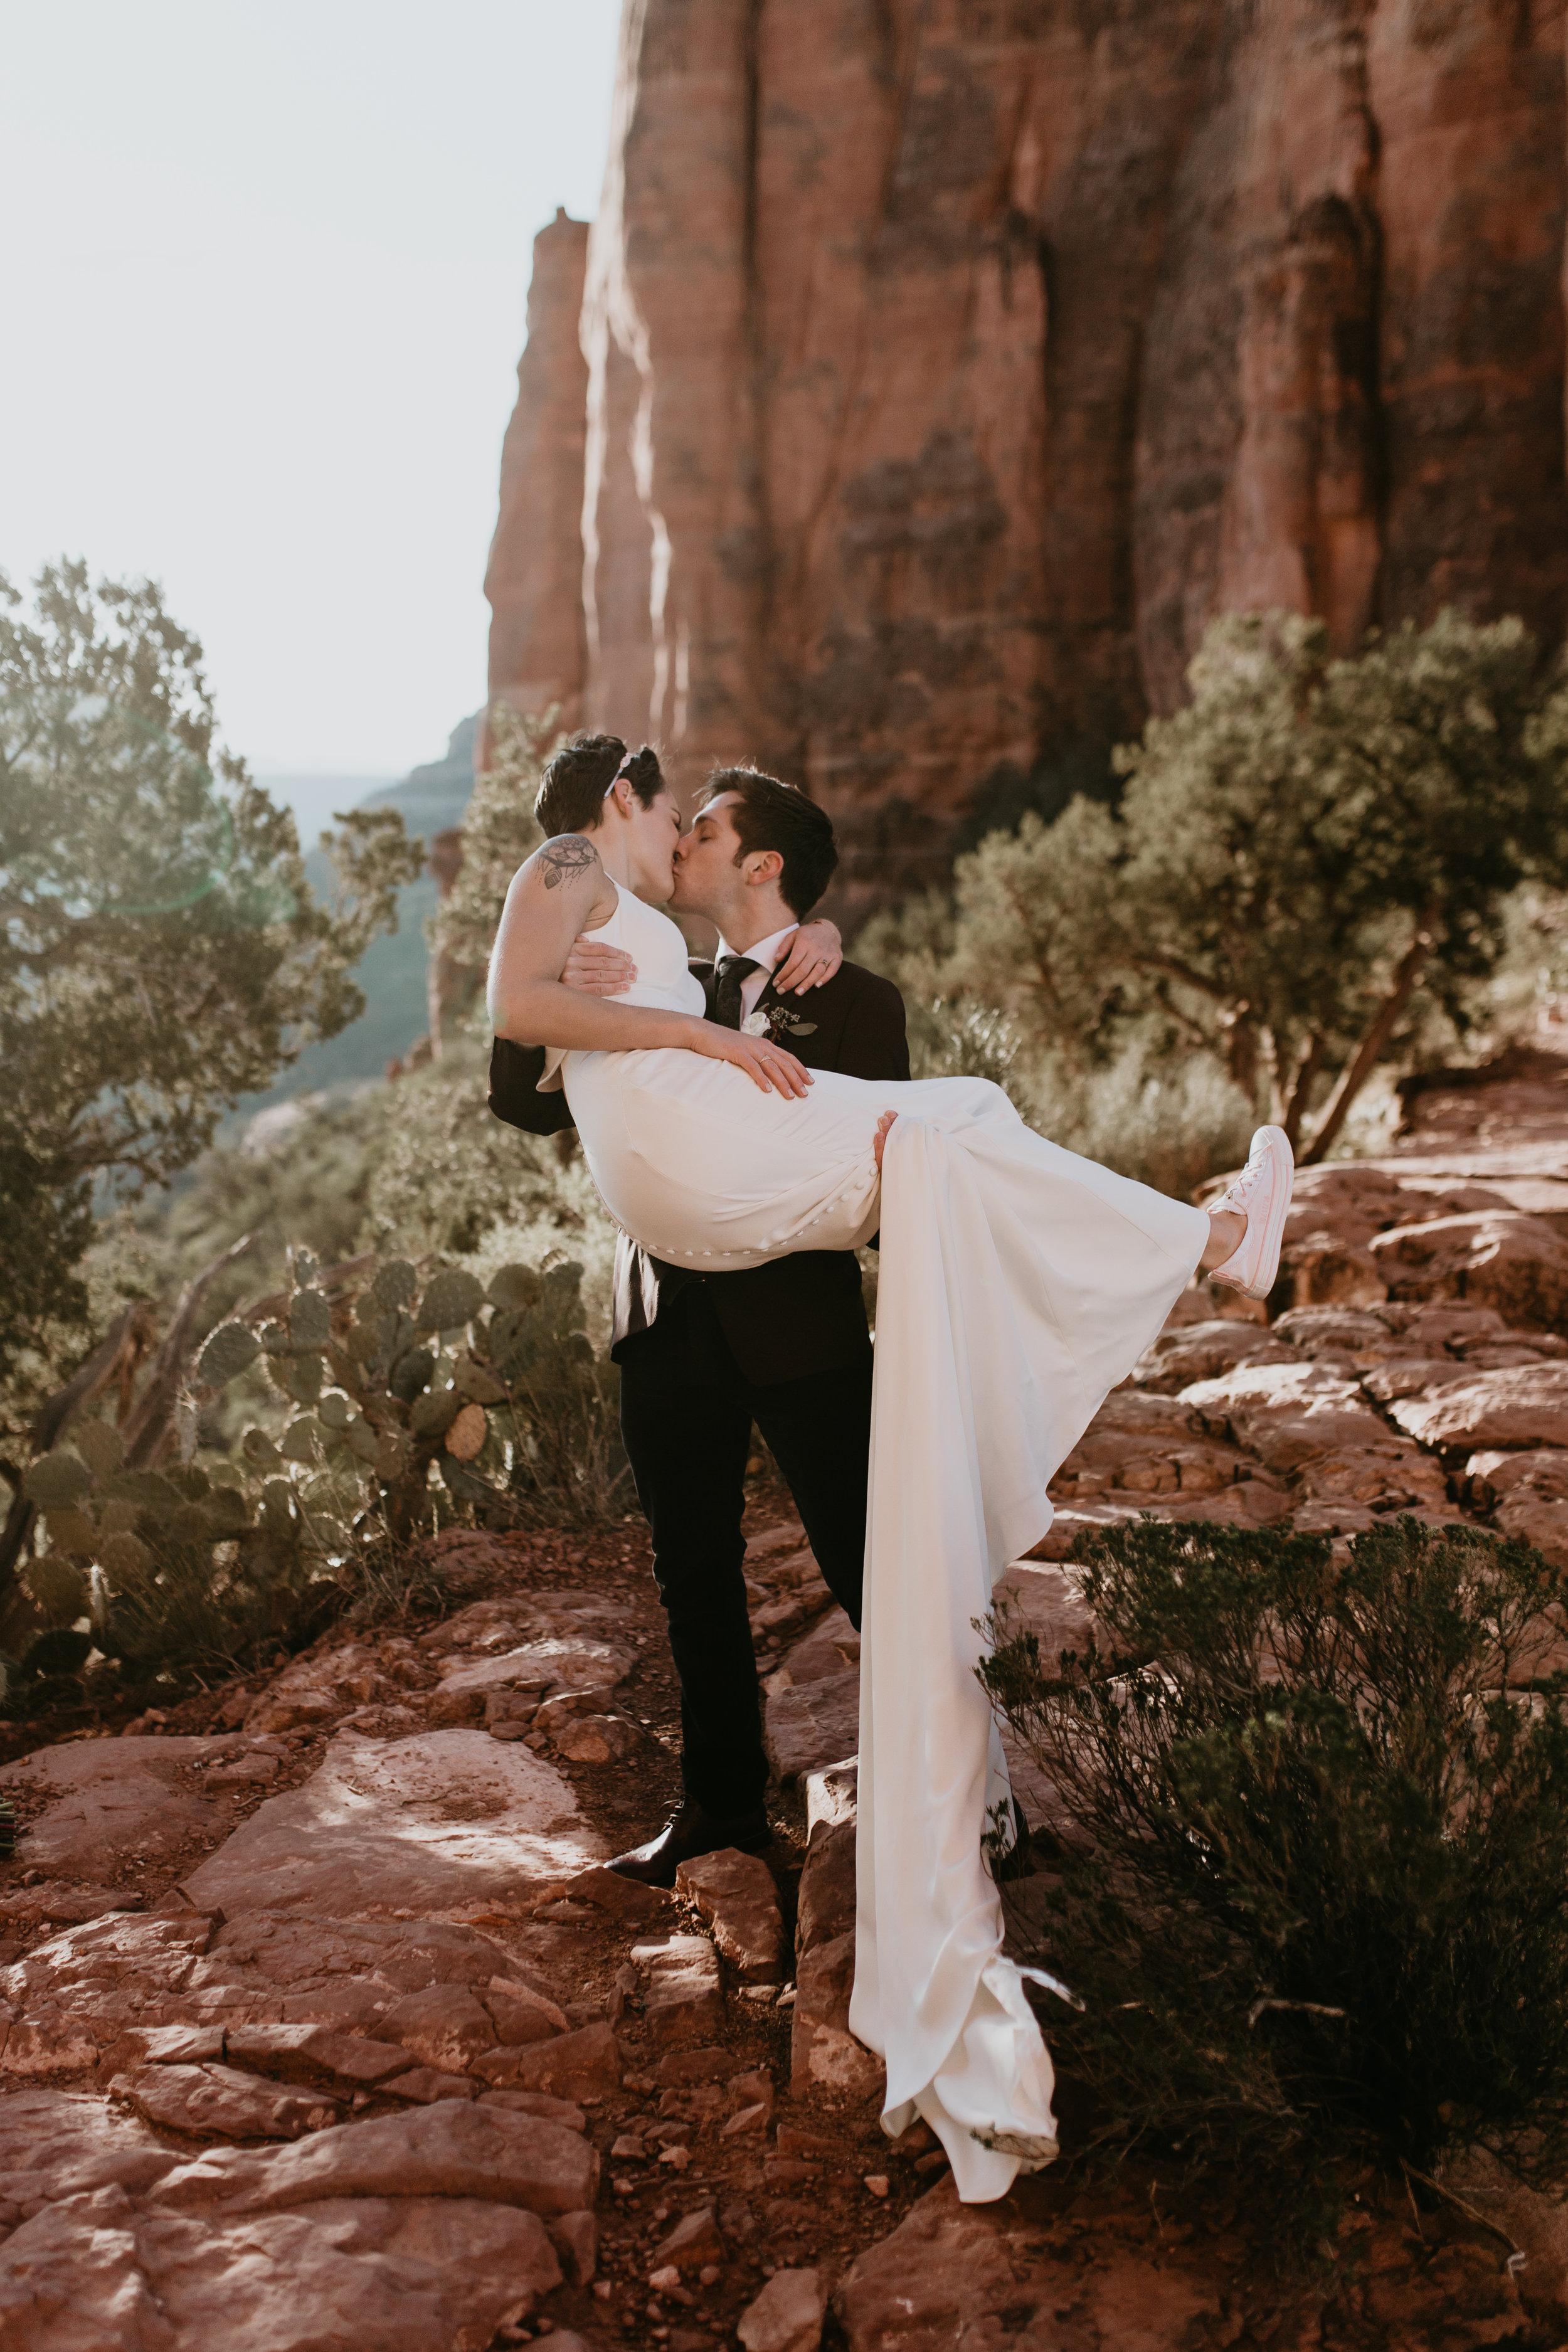 nicole-daacke-photography-sedona-arizona-destination-elopement-wedding-photographer-catherdral-rock-hiking-elopement-sedona-river-elopement-photos-desert-rock-wedding-photographer-laid-back-spontaneous-elopement-55.jpg